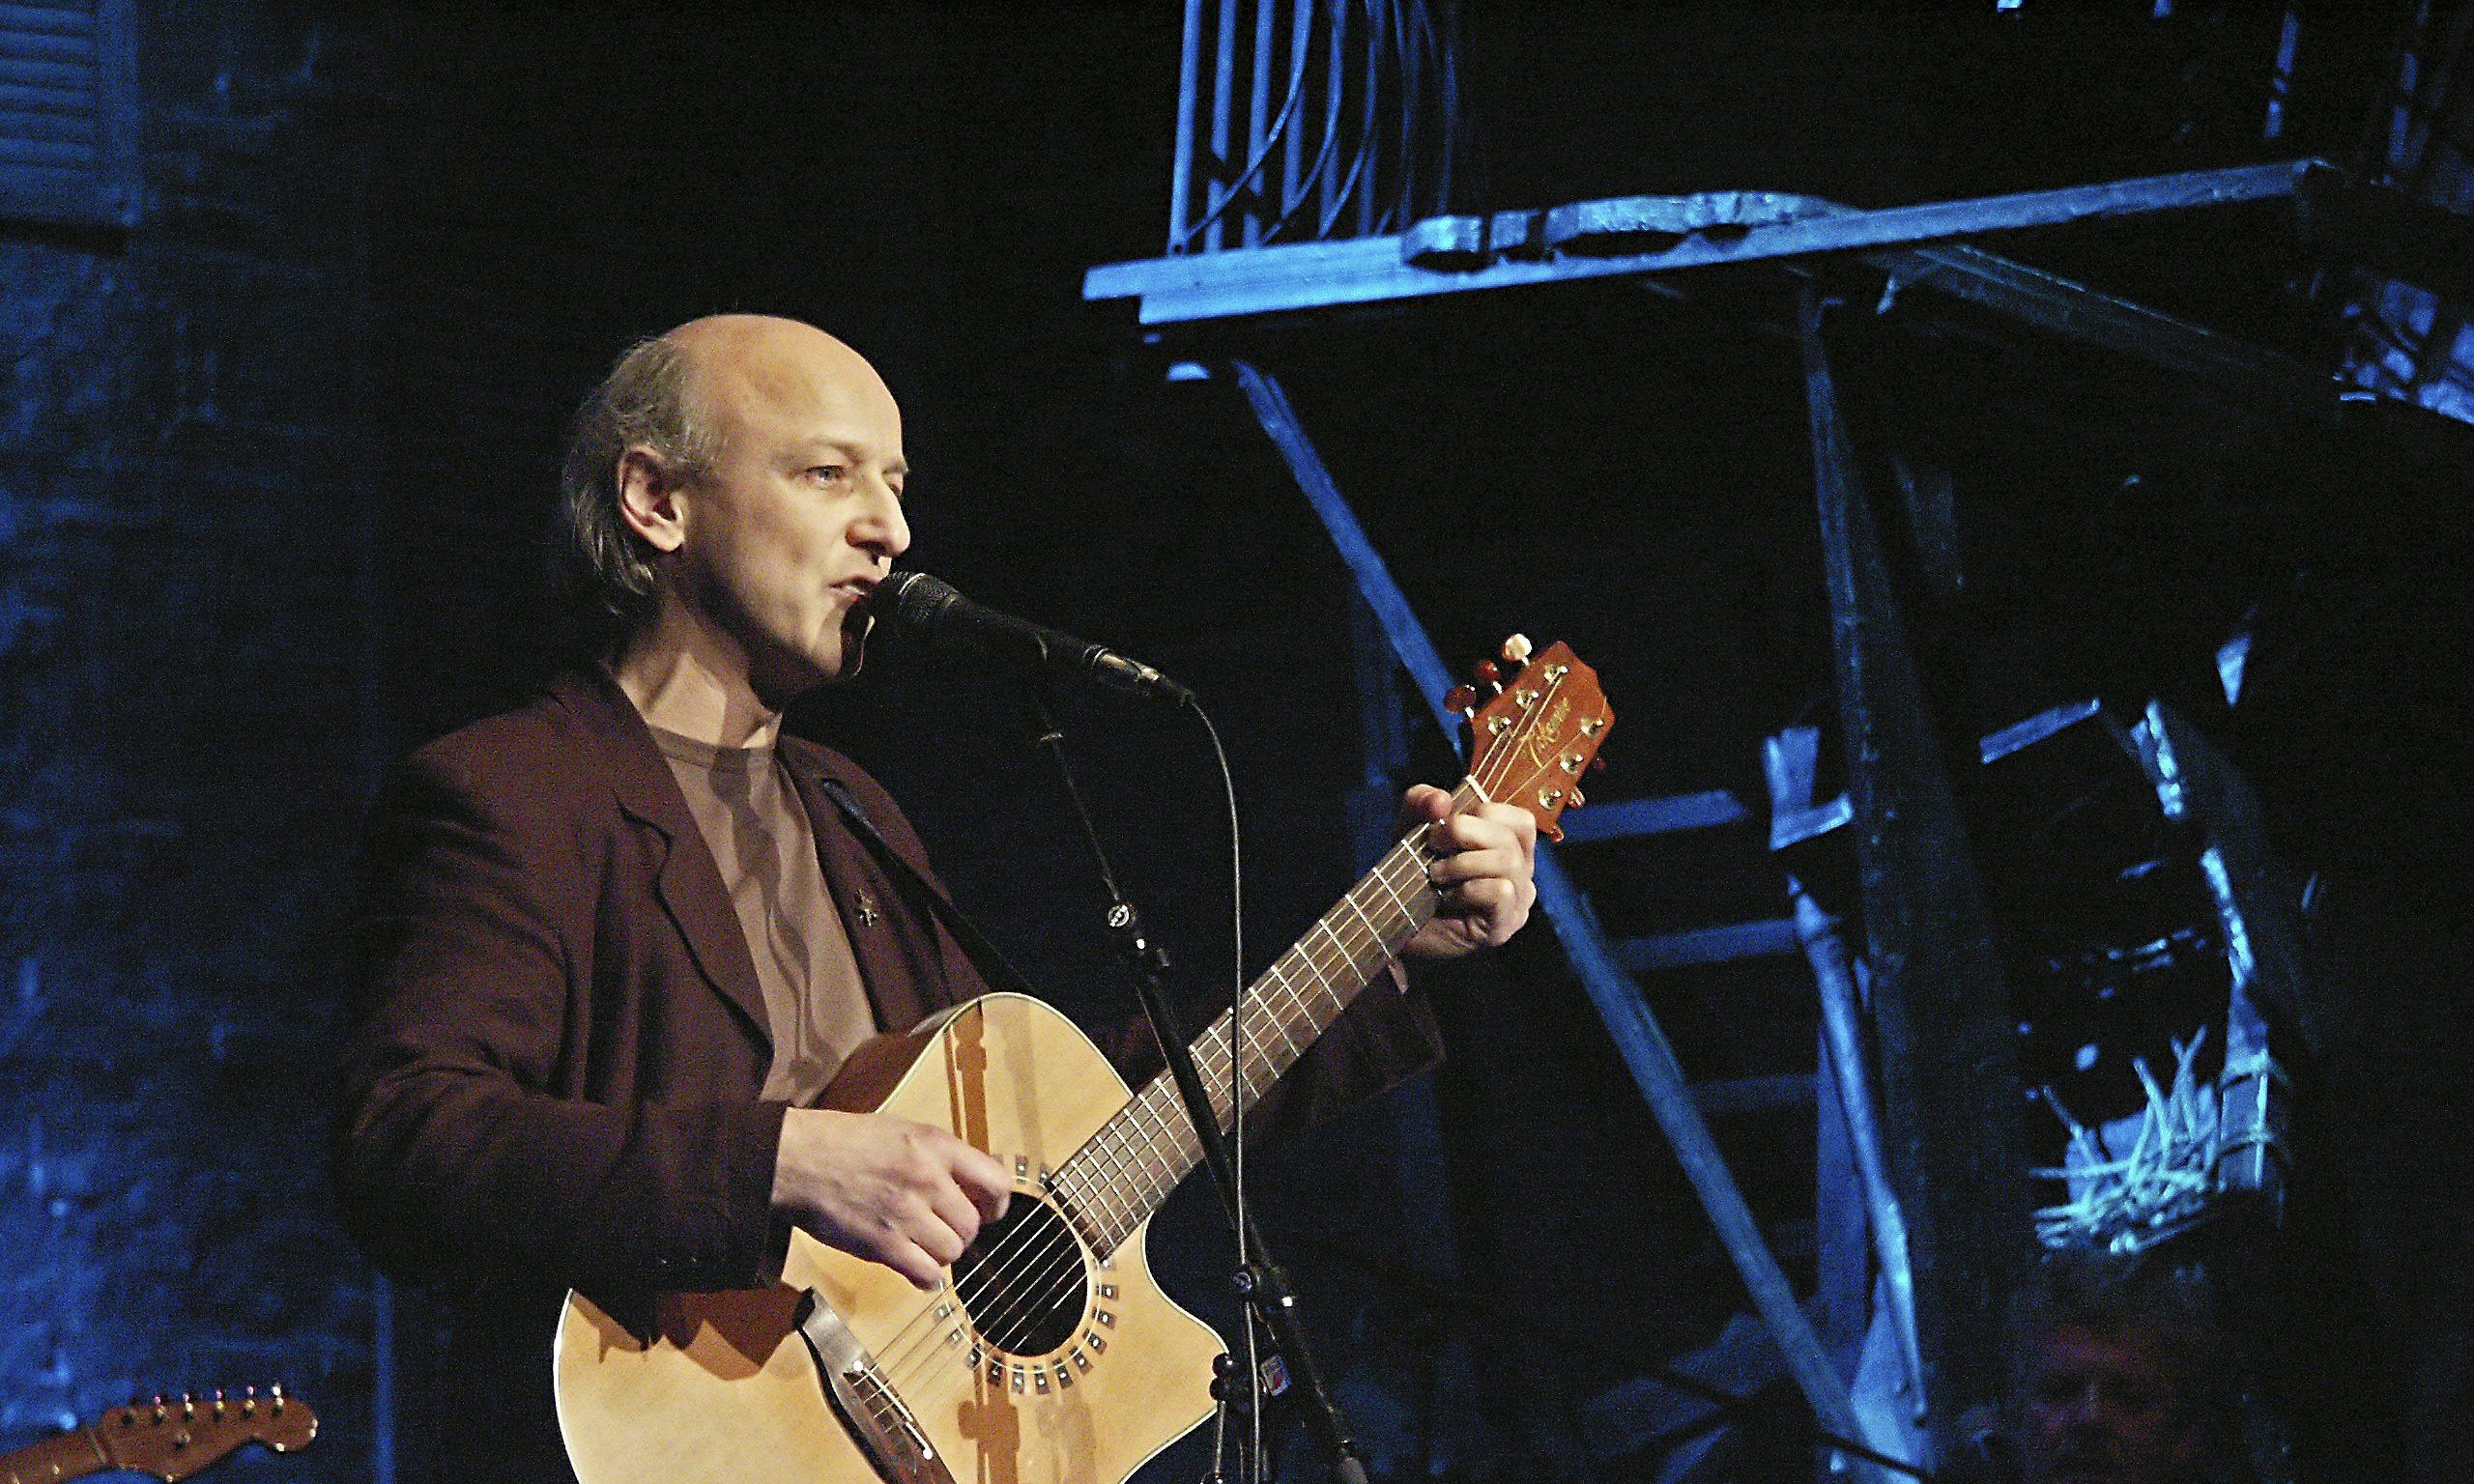 Kerschowski